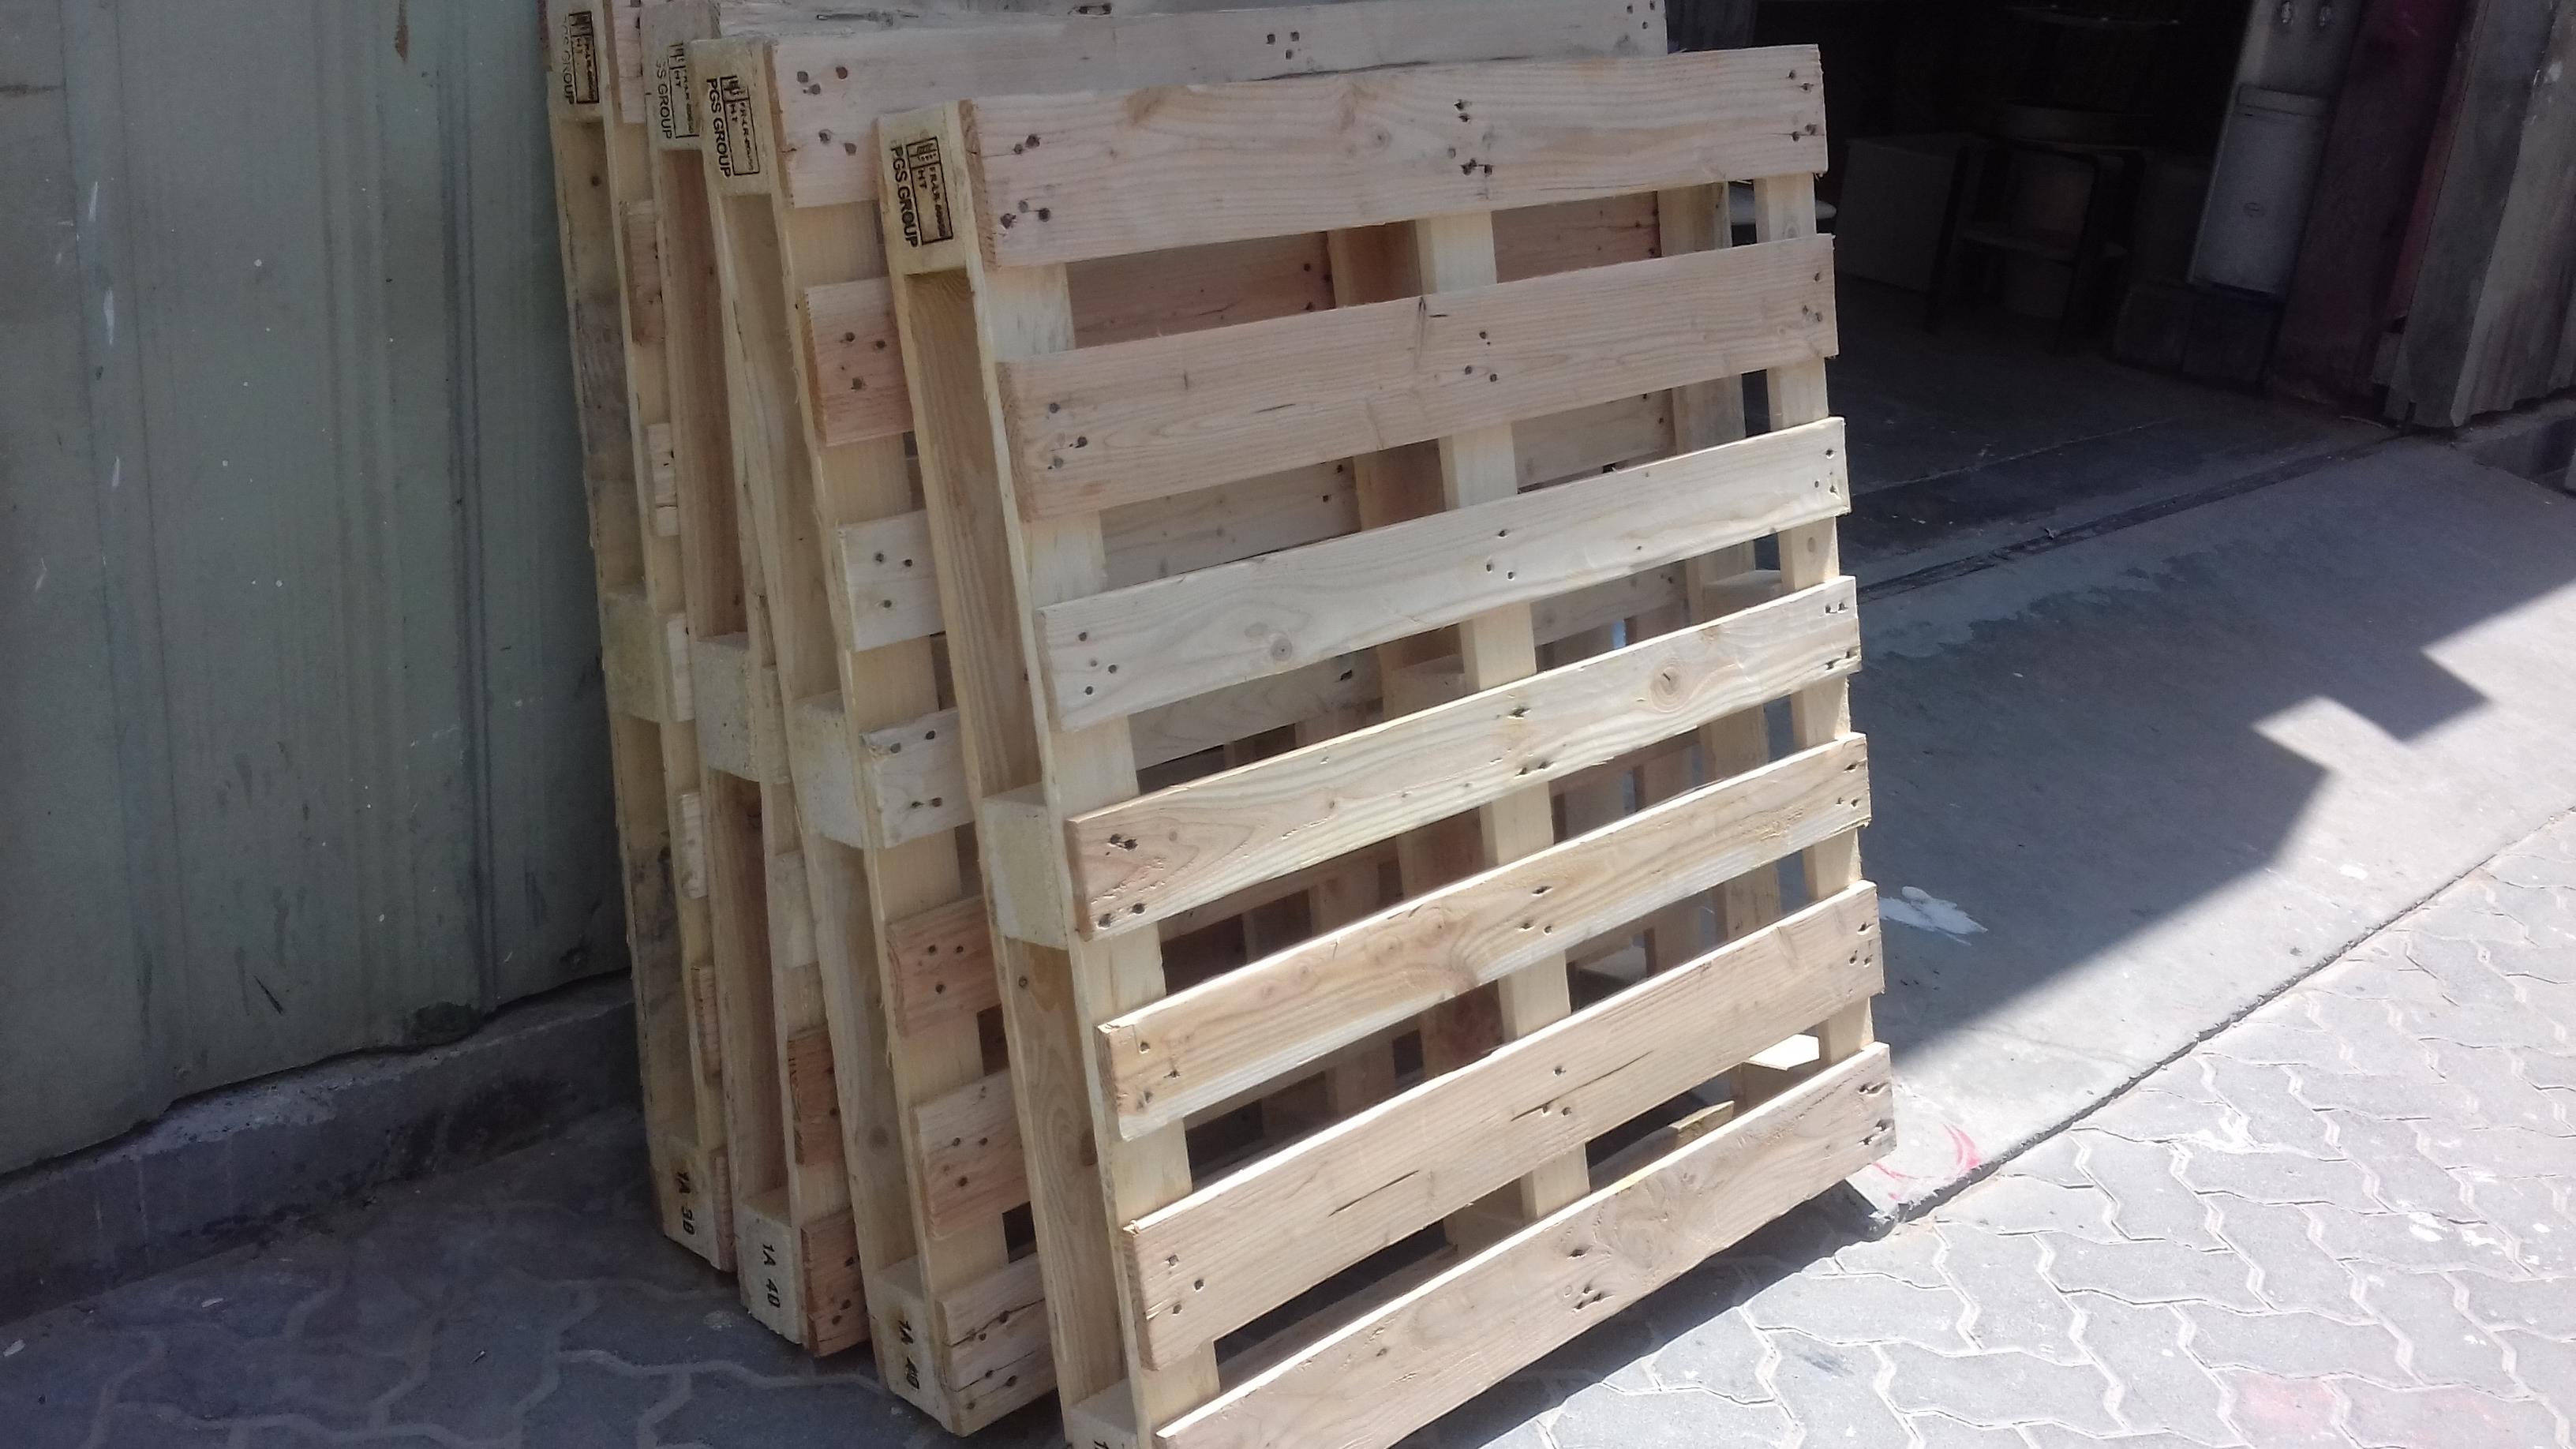 dubai pallets-0555450341 (2).jpg